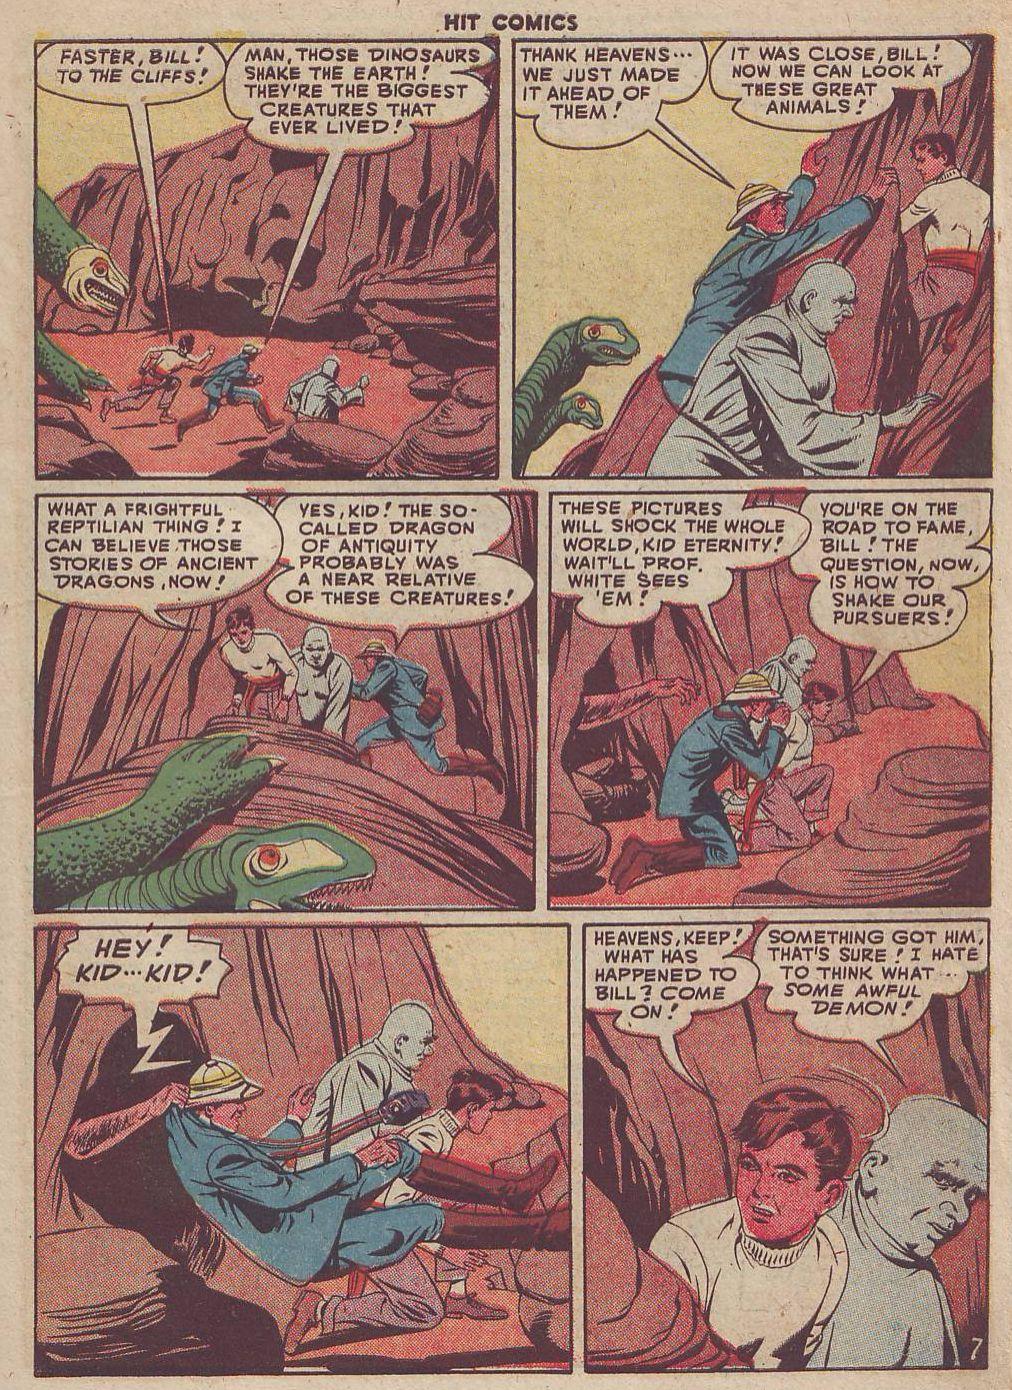 Read online Hit Comics comic -  Issue #51 - 9